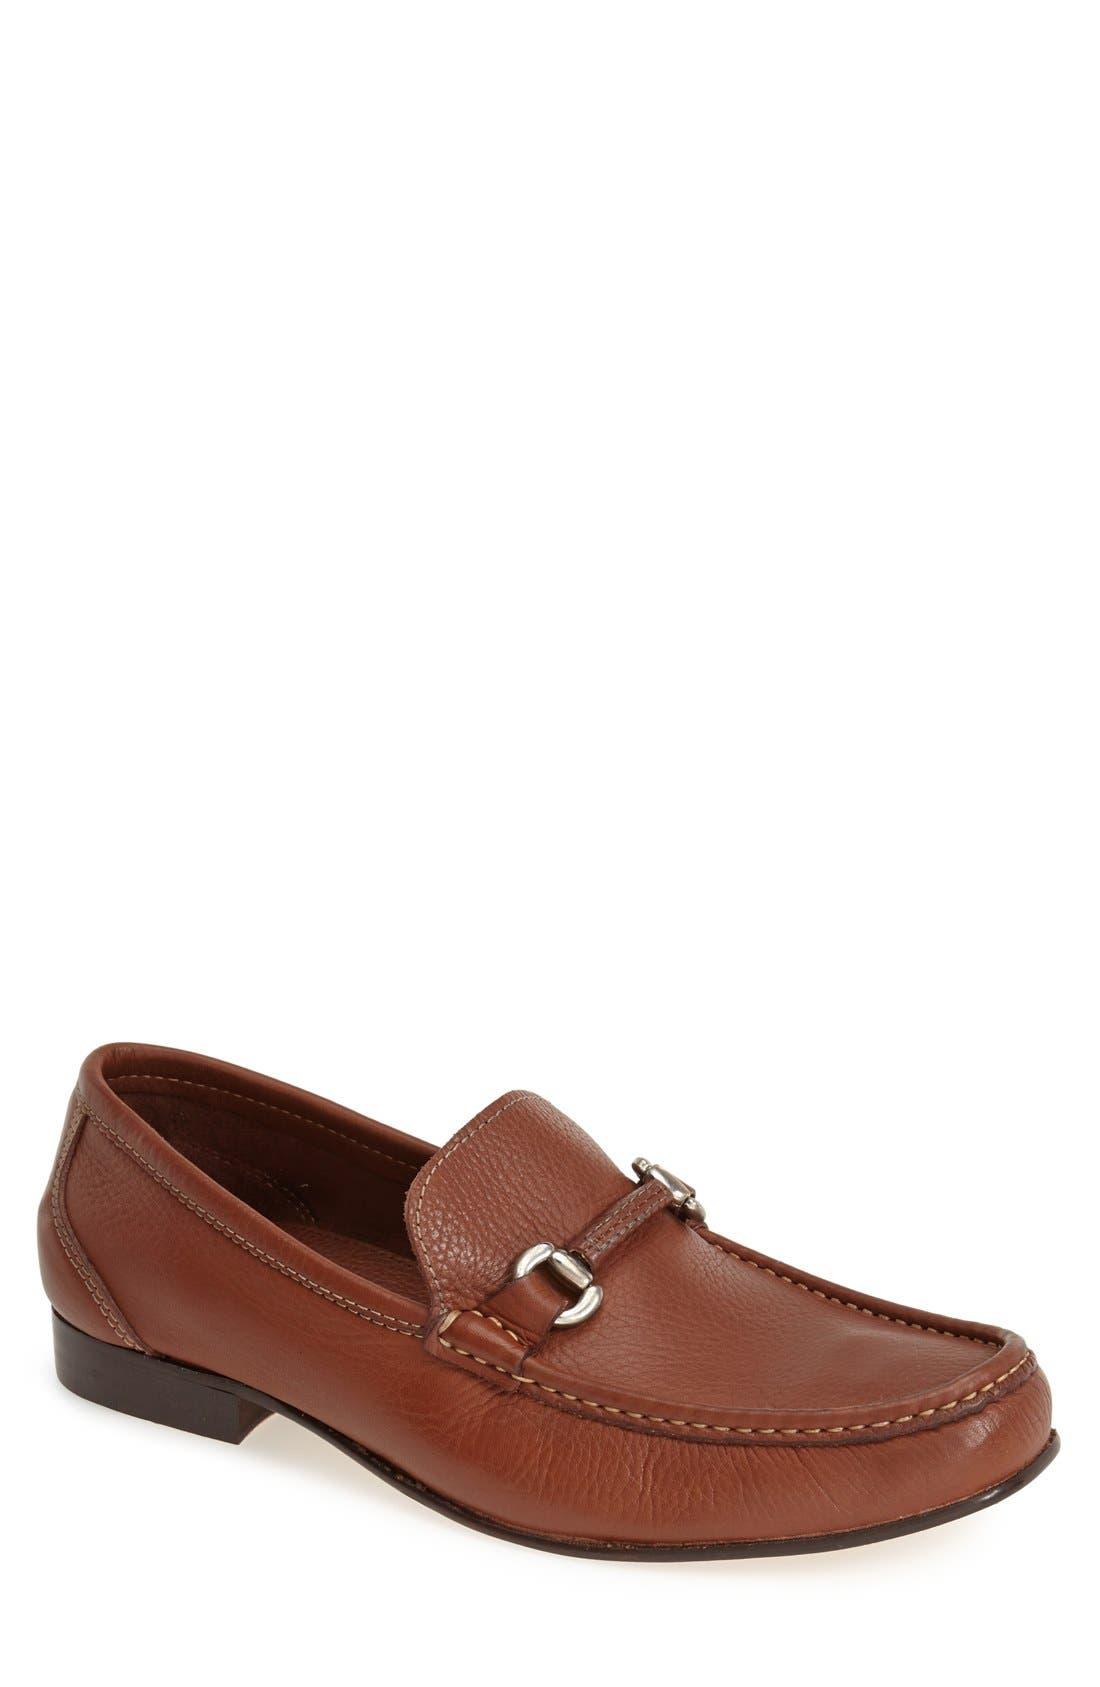 Sandro Moscoloni 'San Remo' Leather Bit Loafer (Men)